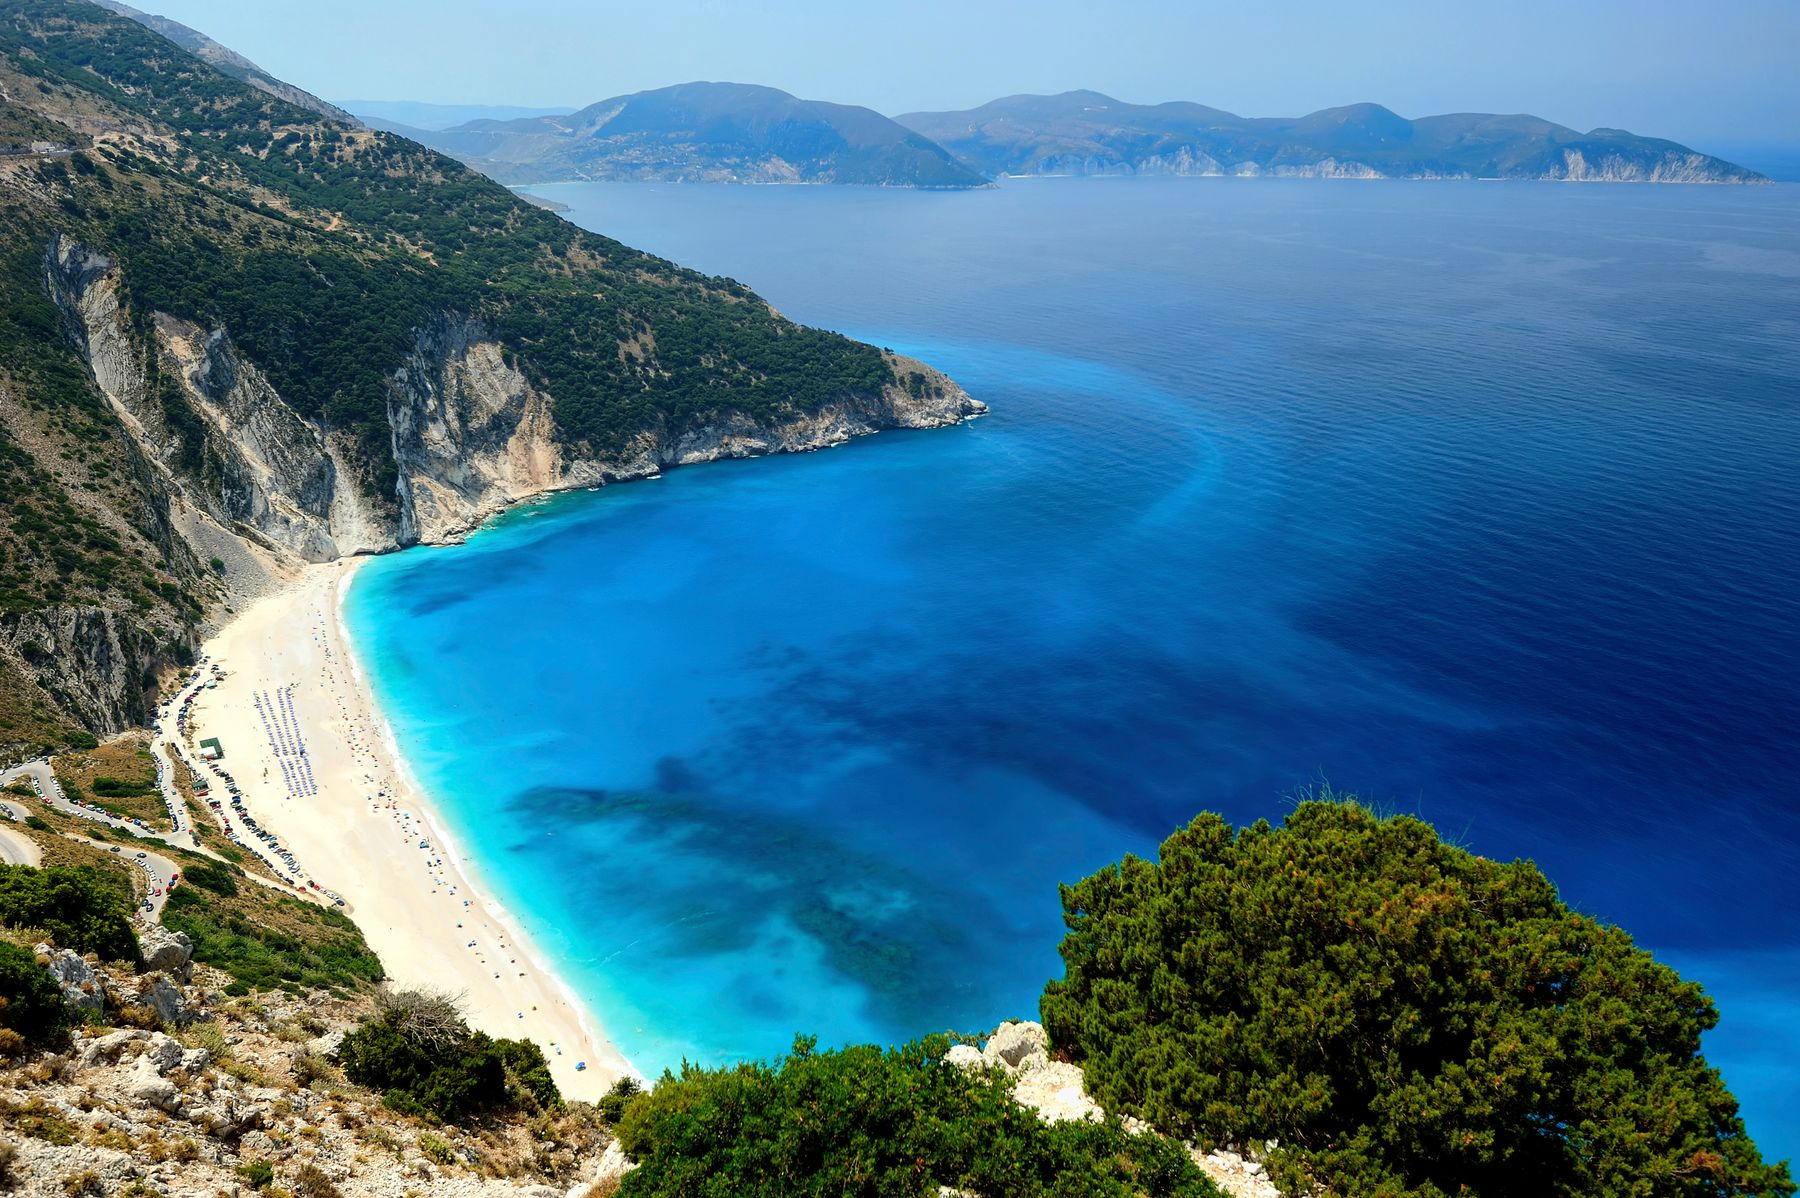 Myrtos: one of the best beaches in Greece